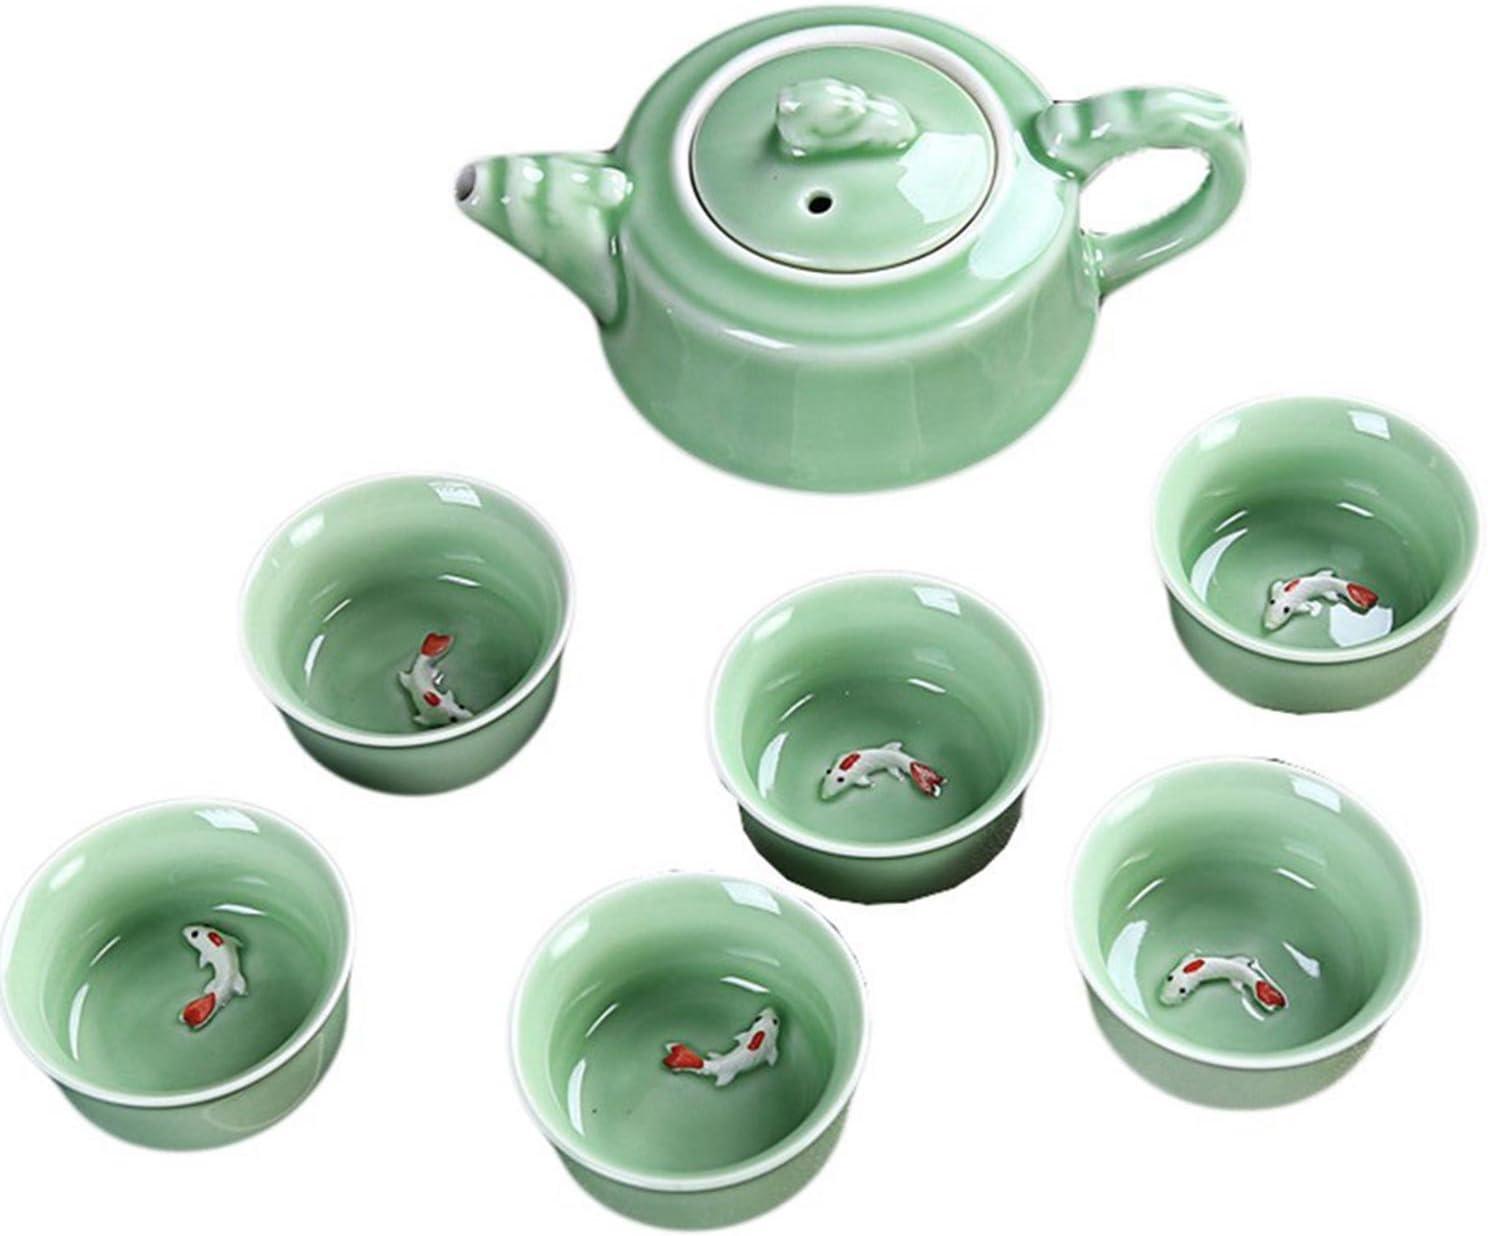 CoreLife Chinese Tea Set Manufacturer OFFicial shop Kung Cheap Fu Handmade Ceramic Porcelain